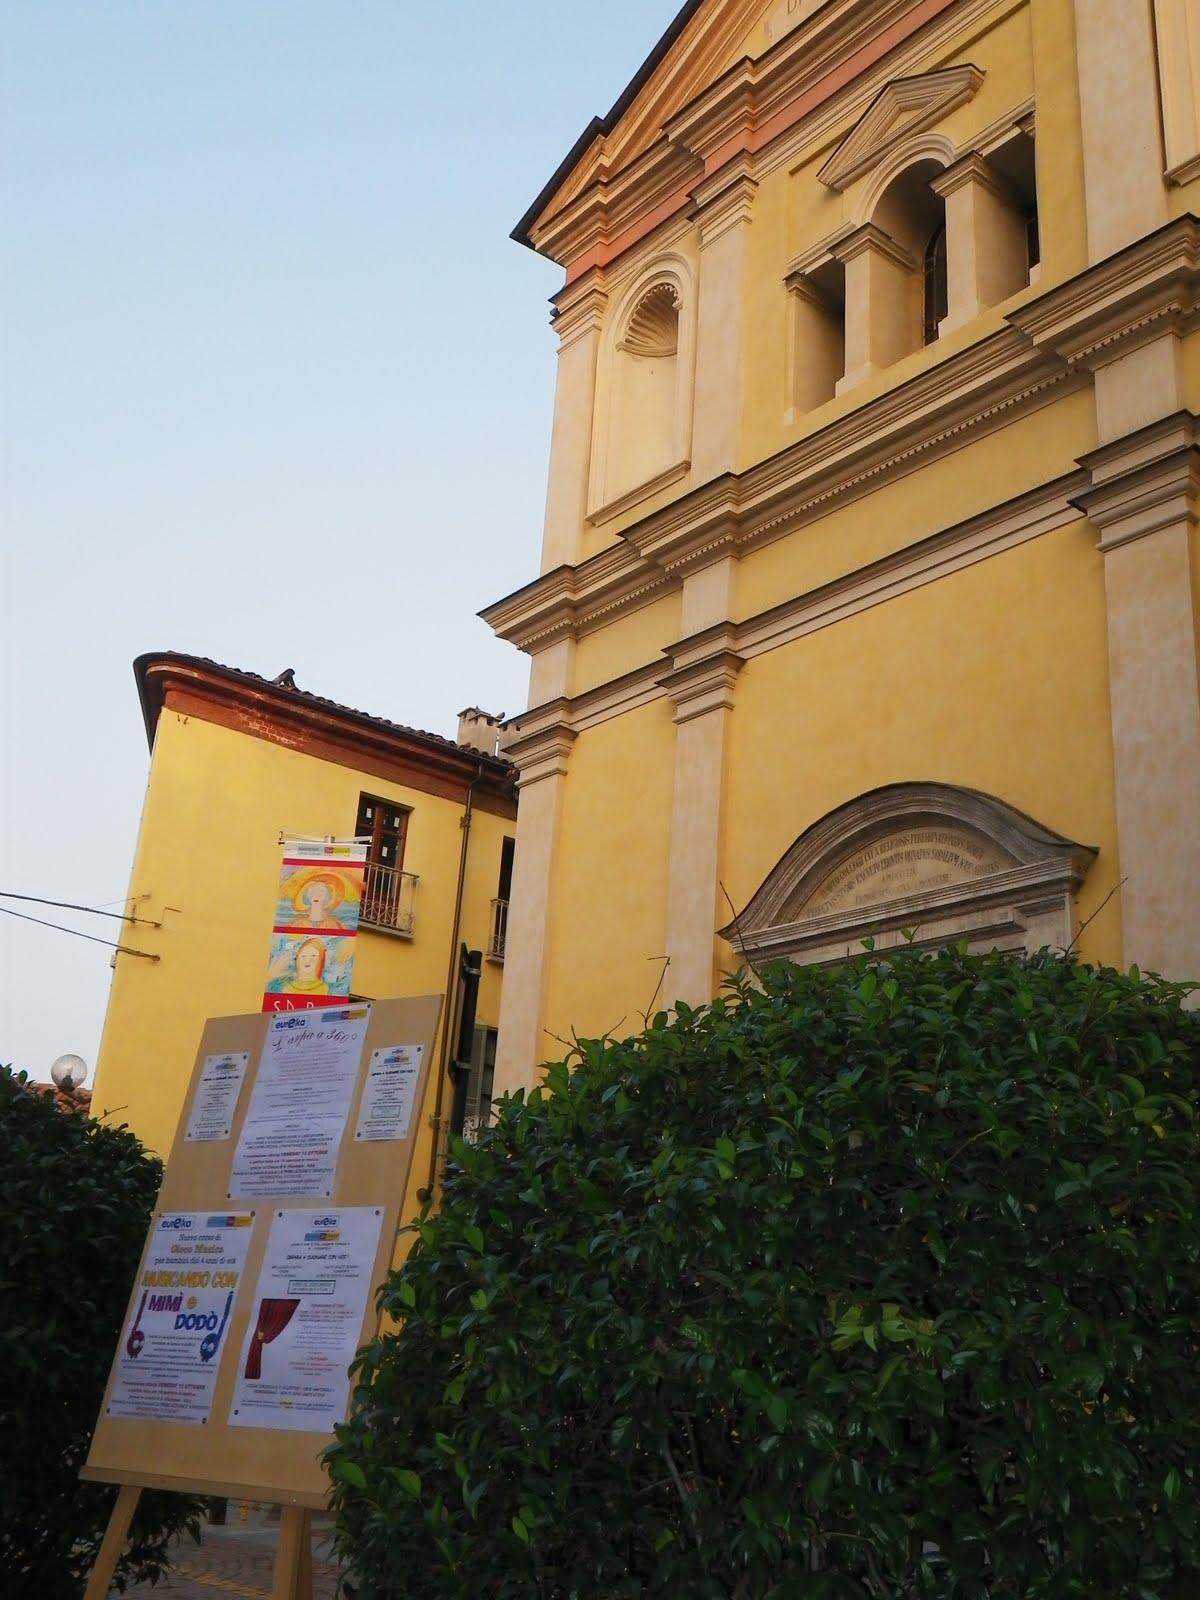 Tm Strumenti Musicali Villa Castelli